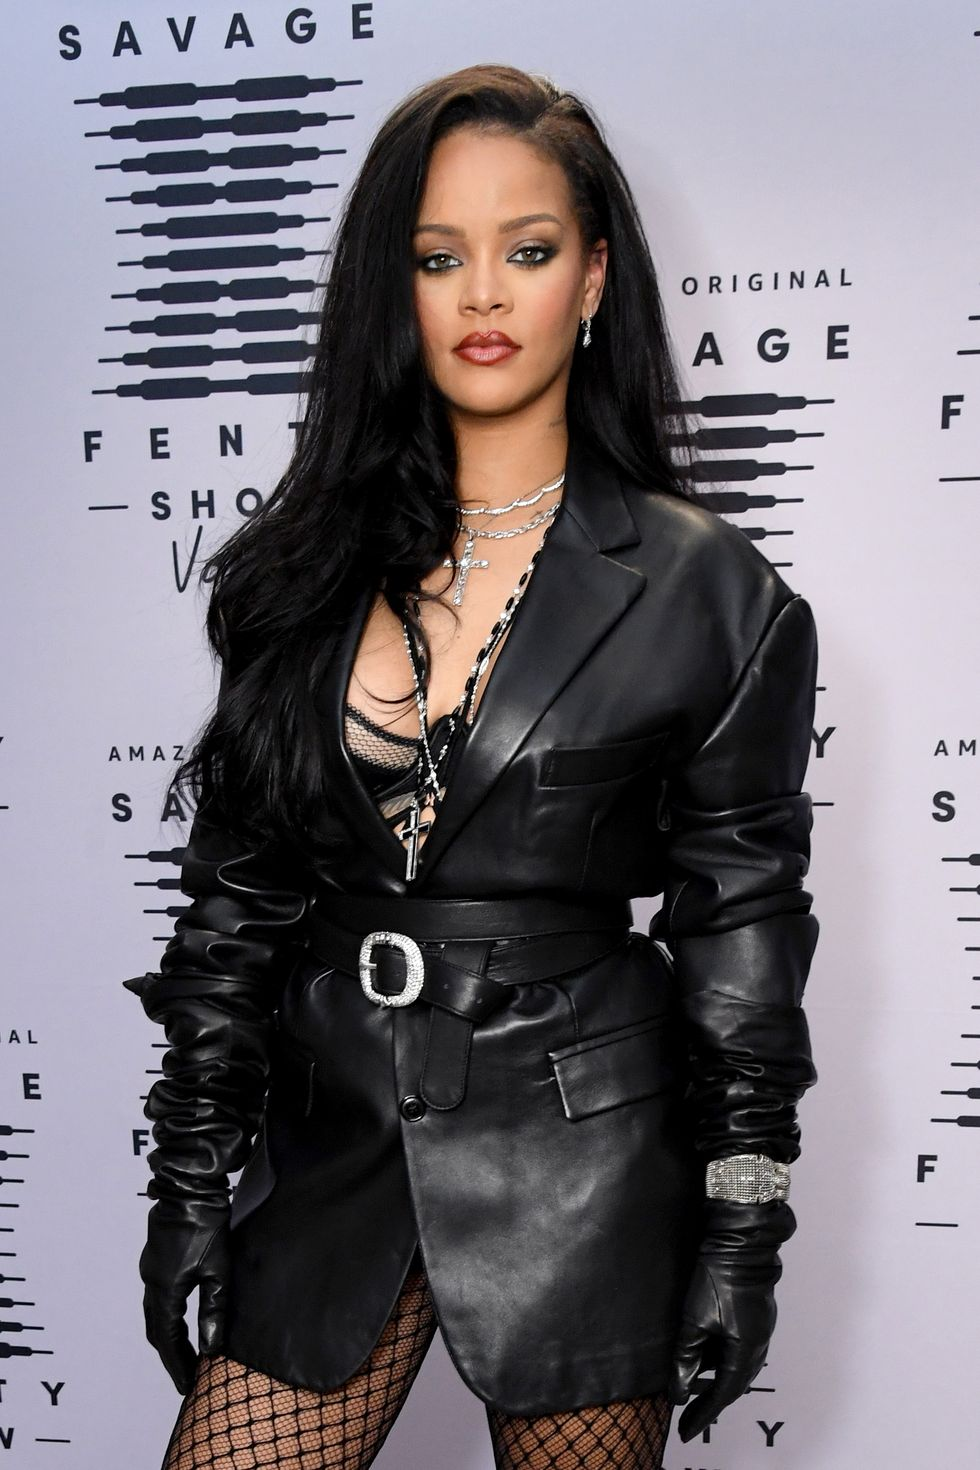 Rihanna SavageFenty Show 2020 - Neomag.